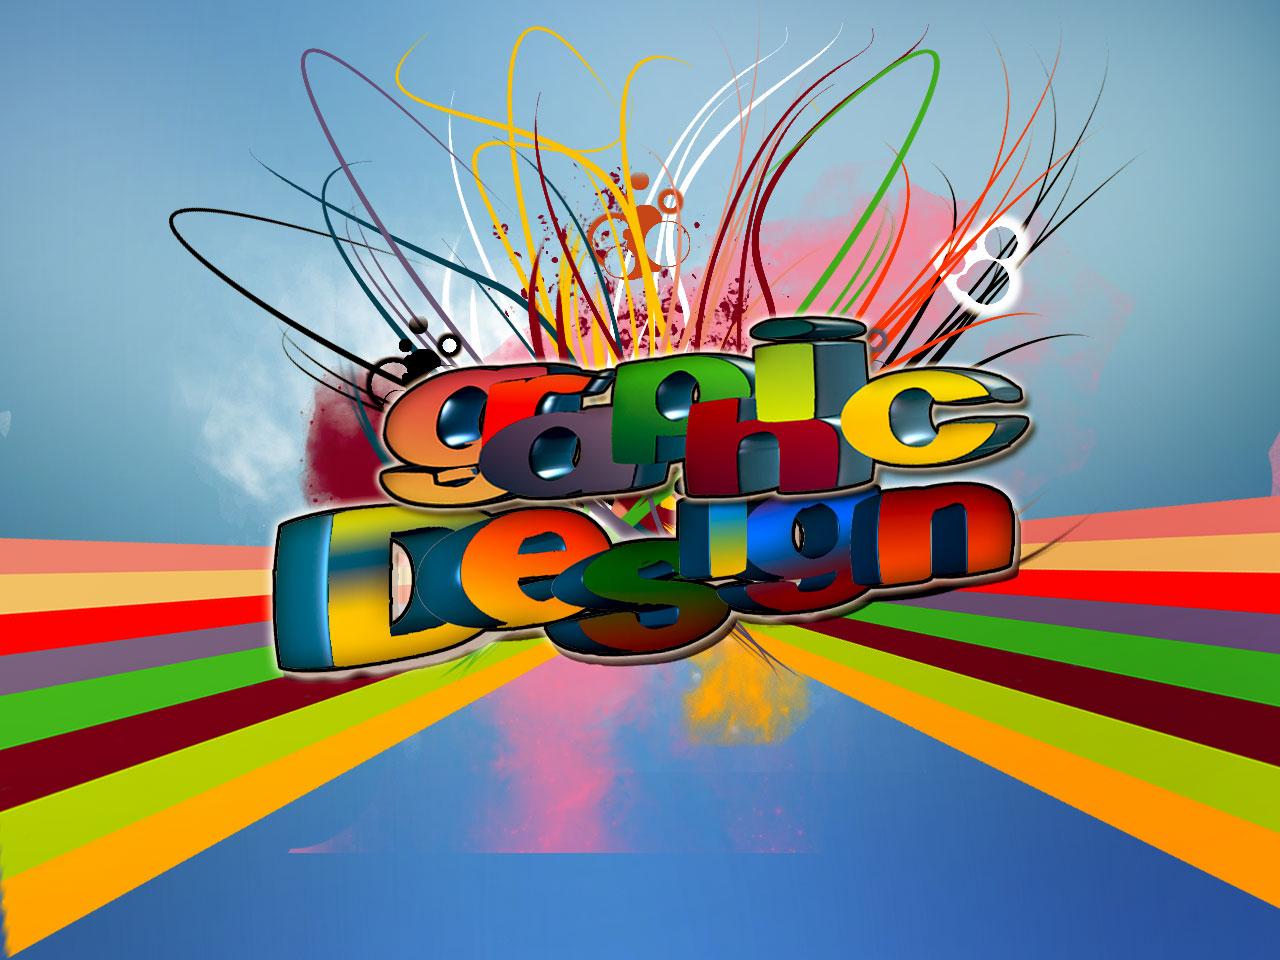 Graphic Design for Visual Presentations 4/1